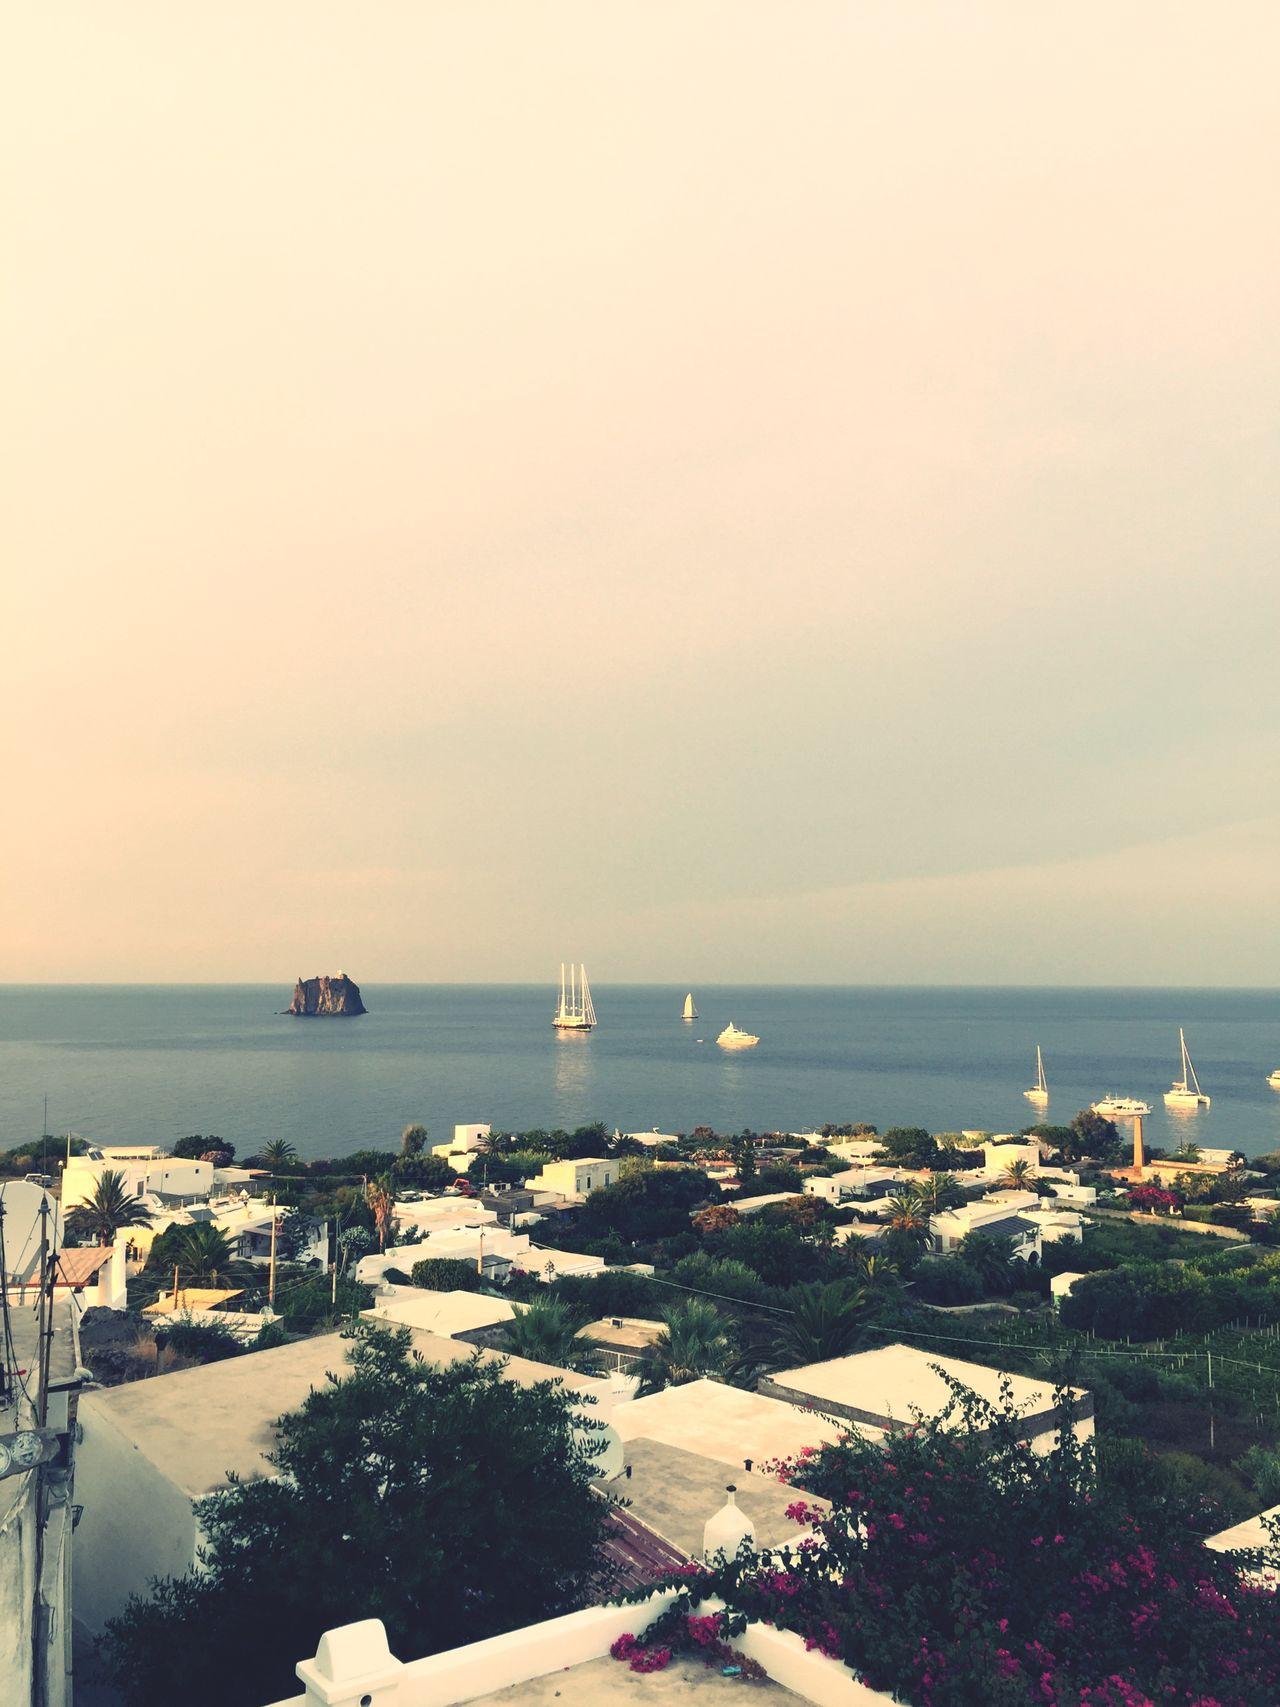 Enjoying The View Seascape Illes Balears